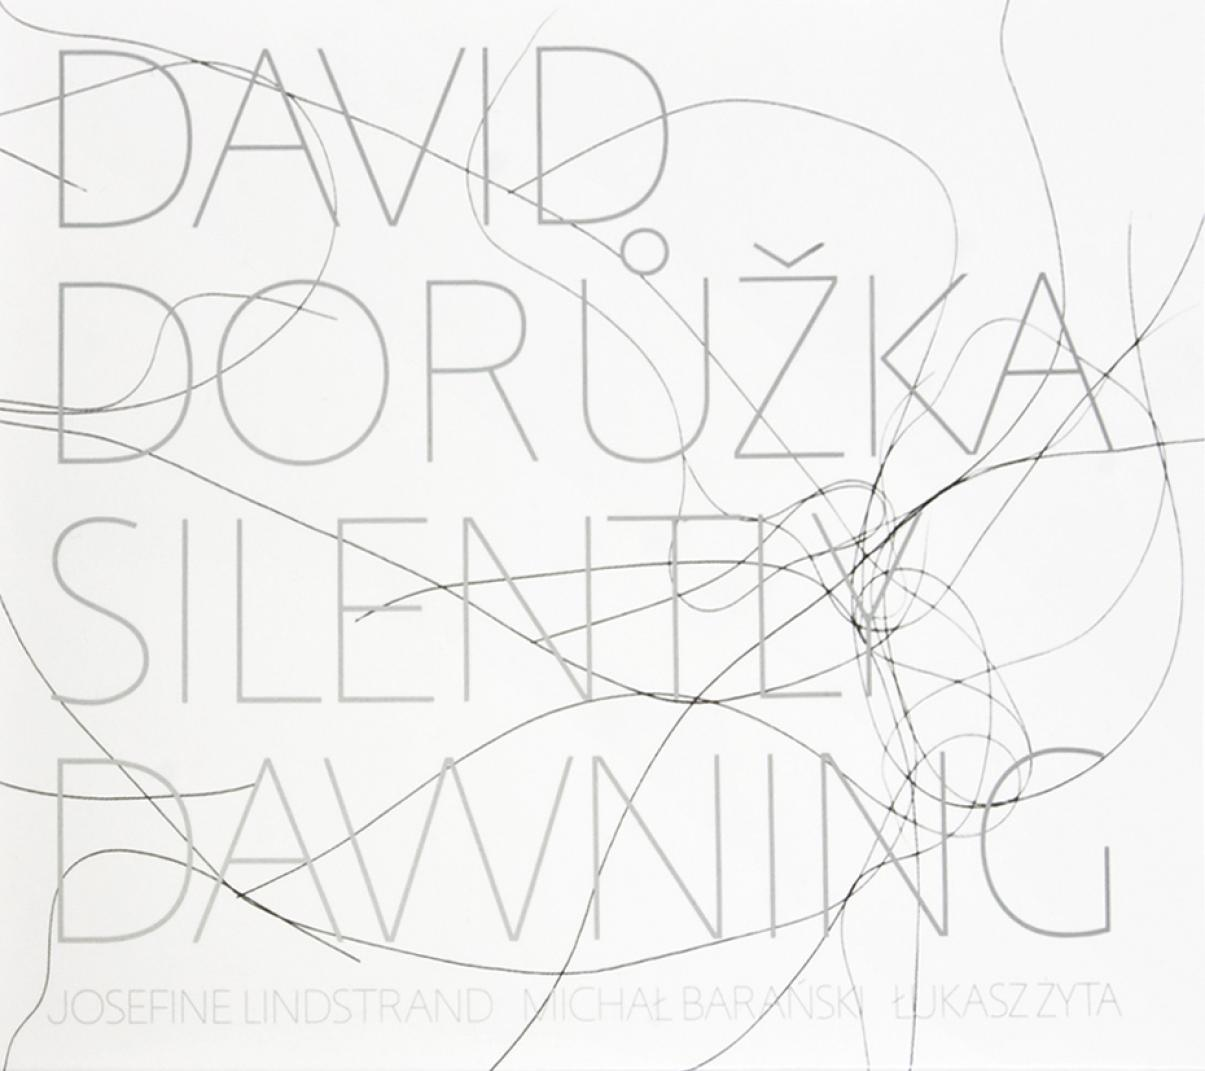 David Dorůžka: Silently Dawning